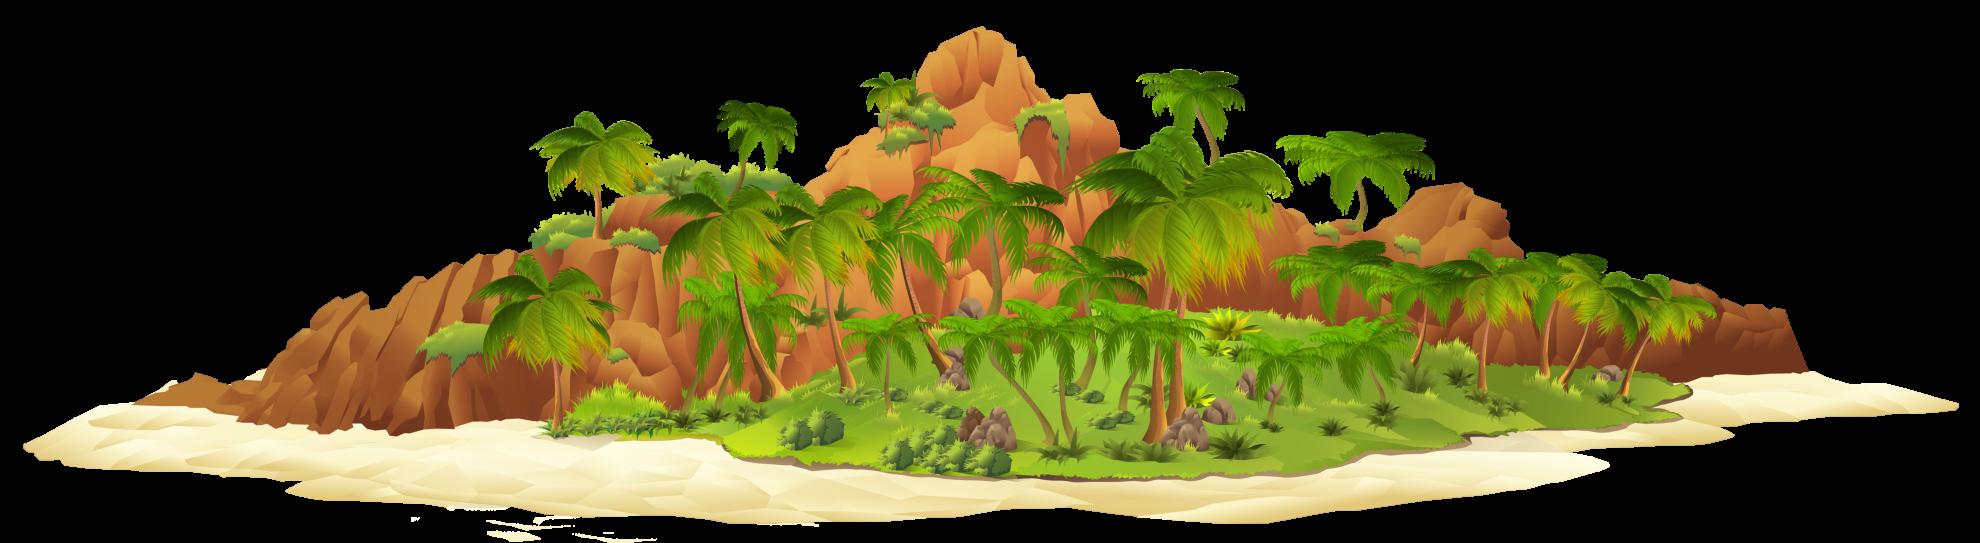 Острова картинки для детей на прозрачном фоне